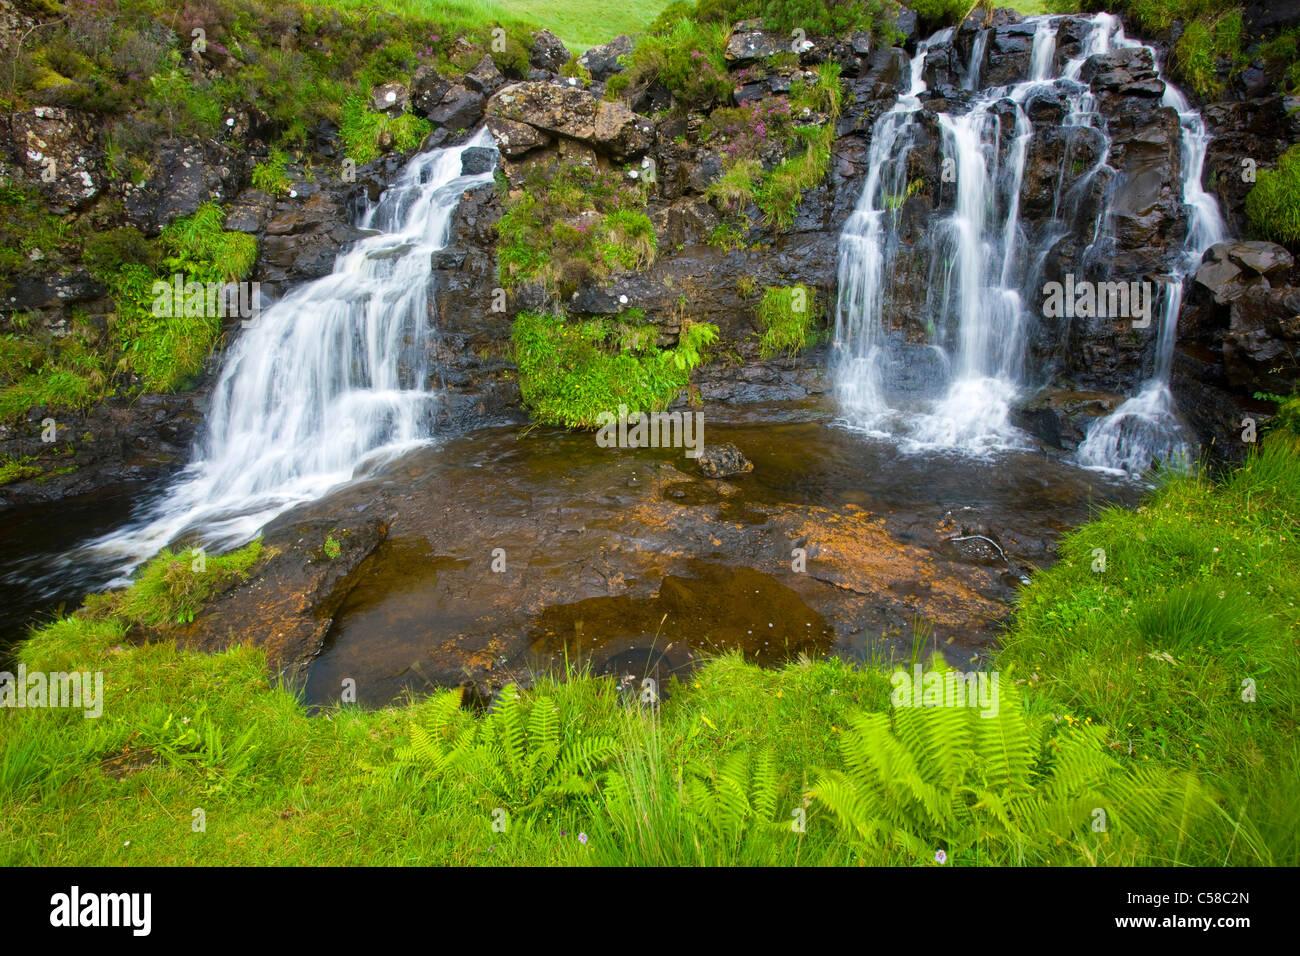 Fairy pools, Great Britain, Scotland, Europe, island, isle, Skye, brook, rock, cliff, waterfalls, fern - Stock Image